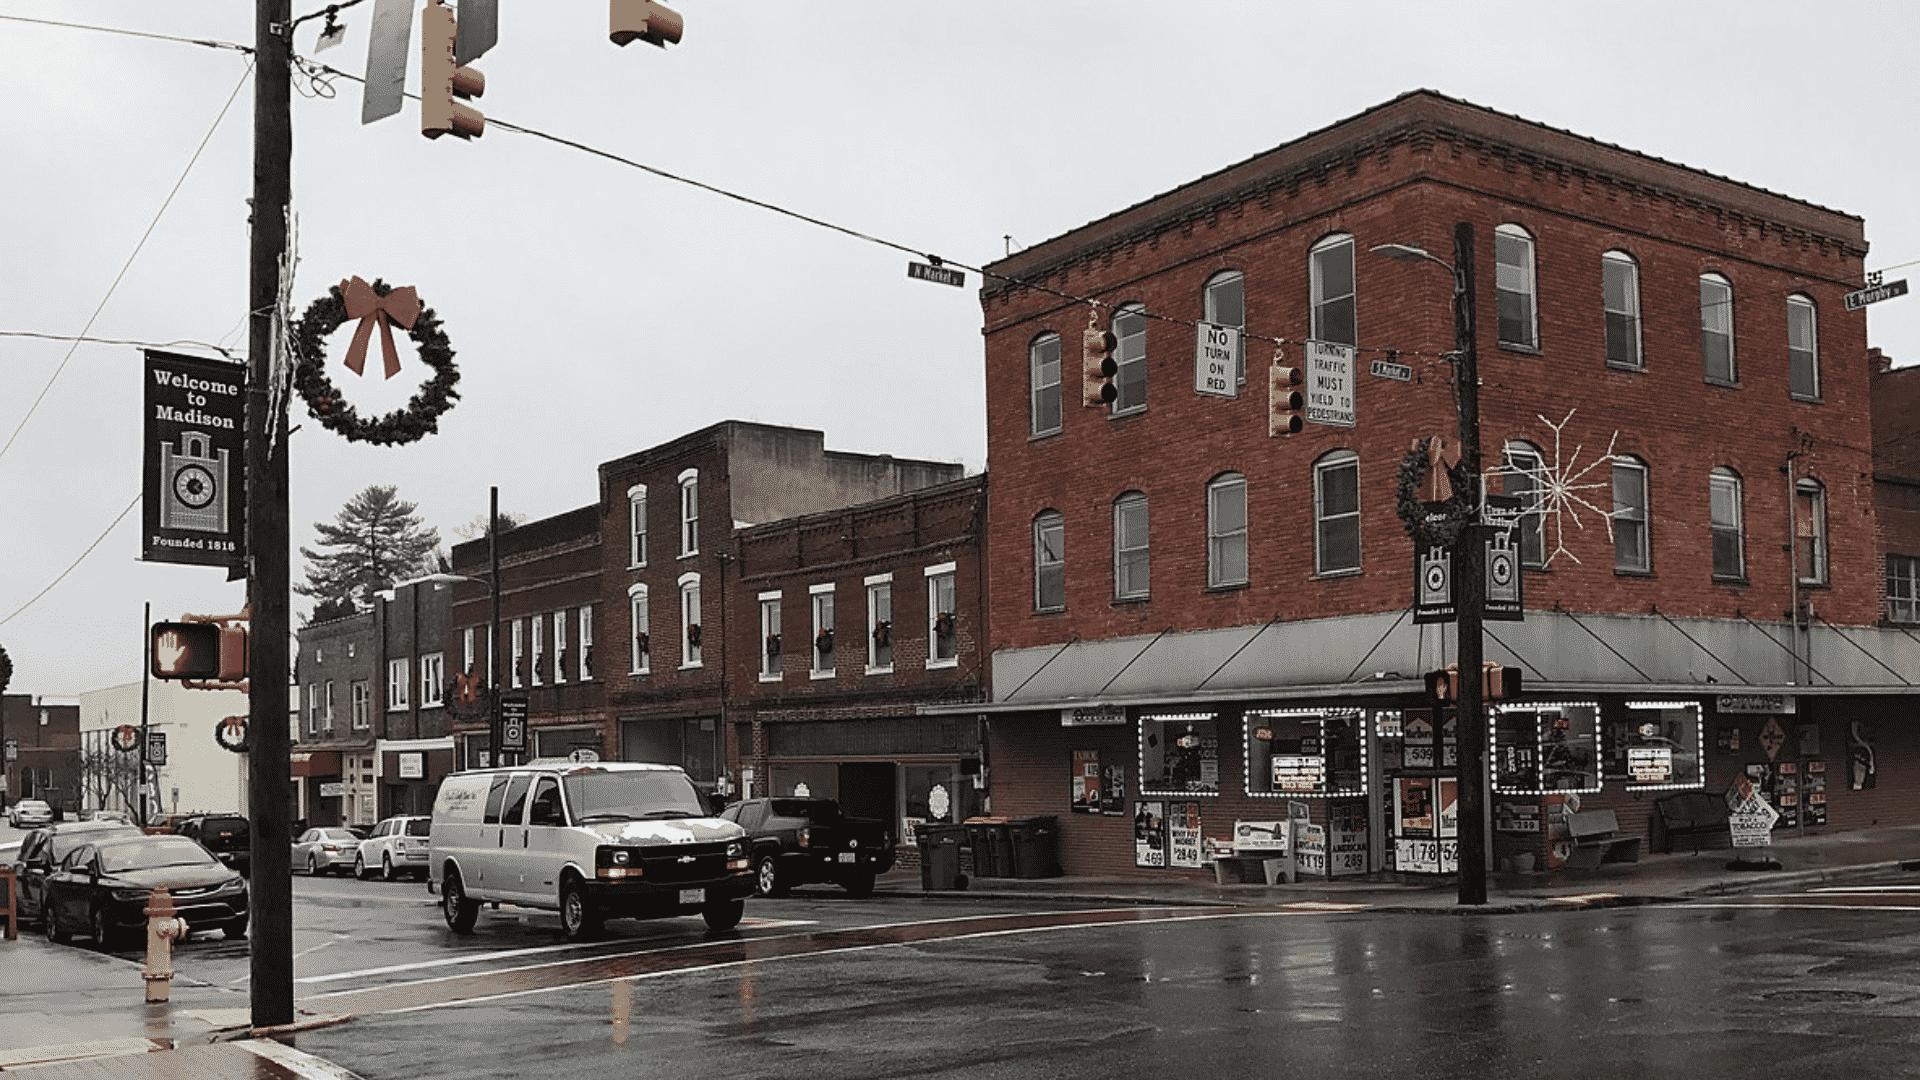 Madison North Carolina